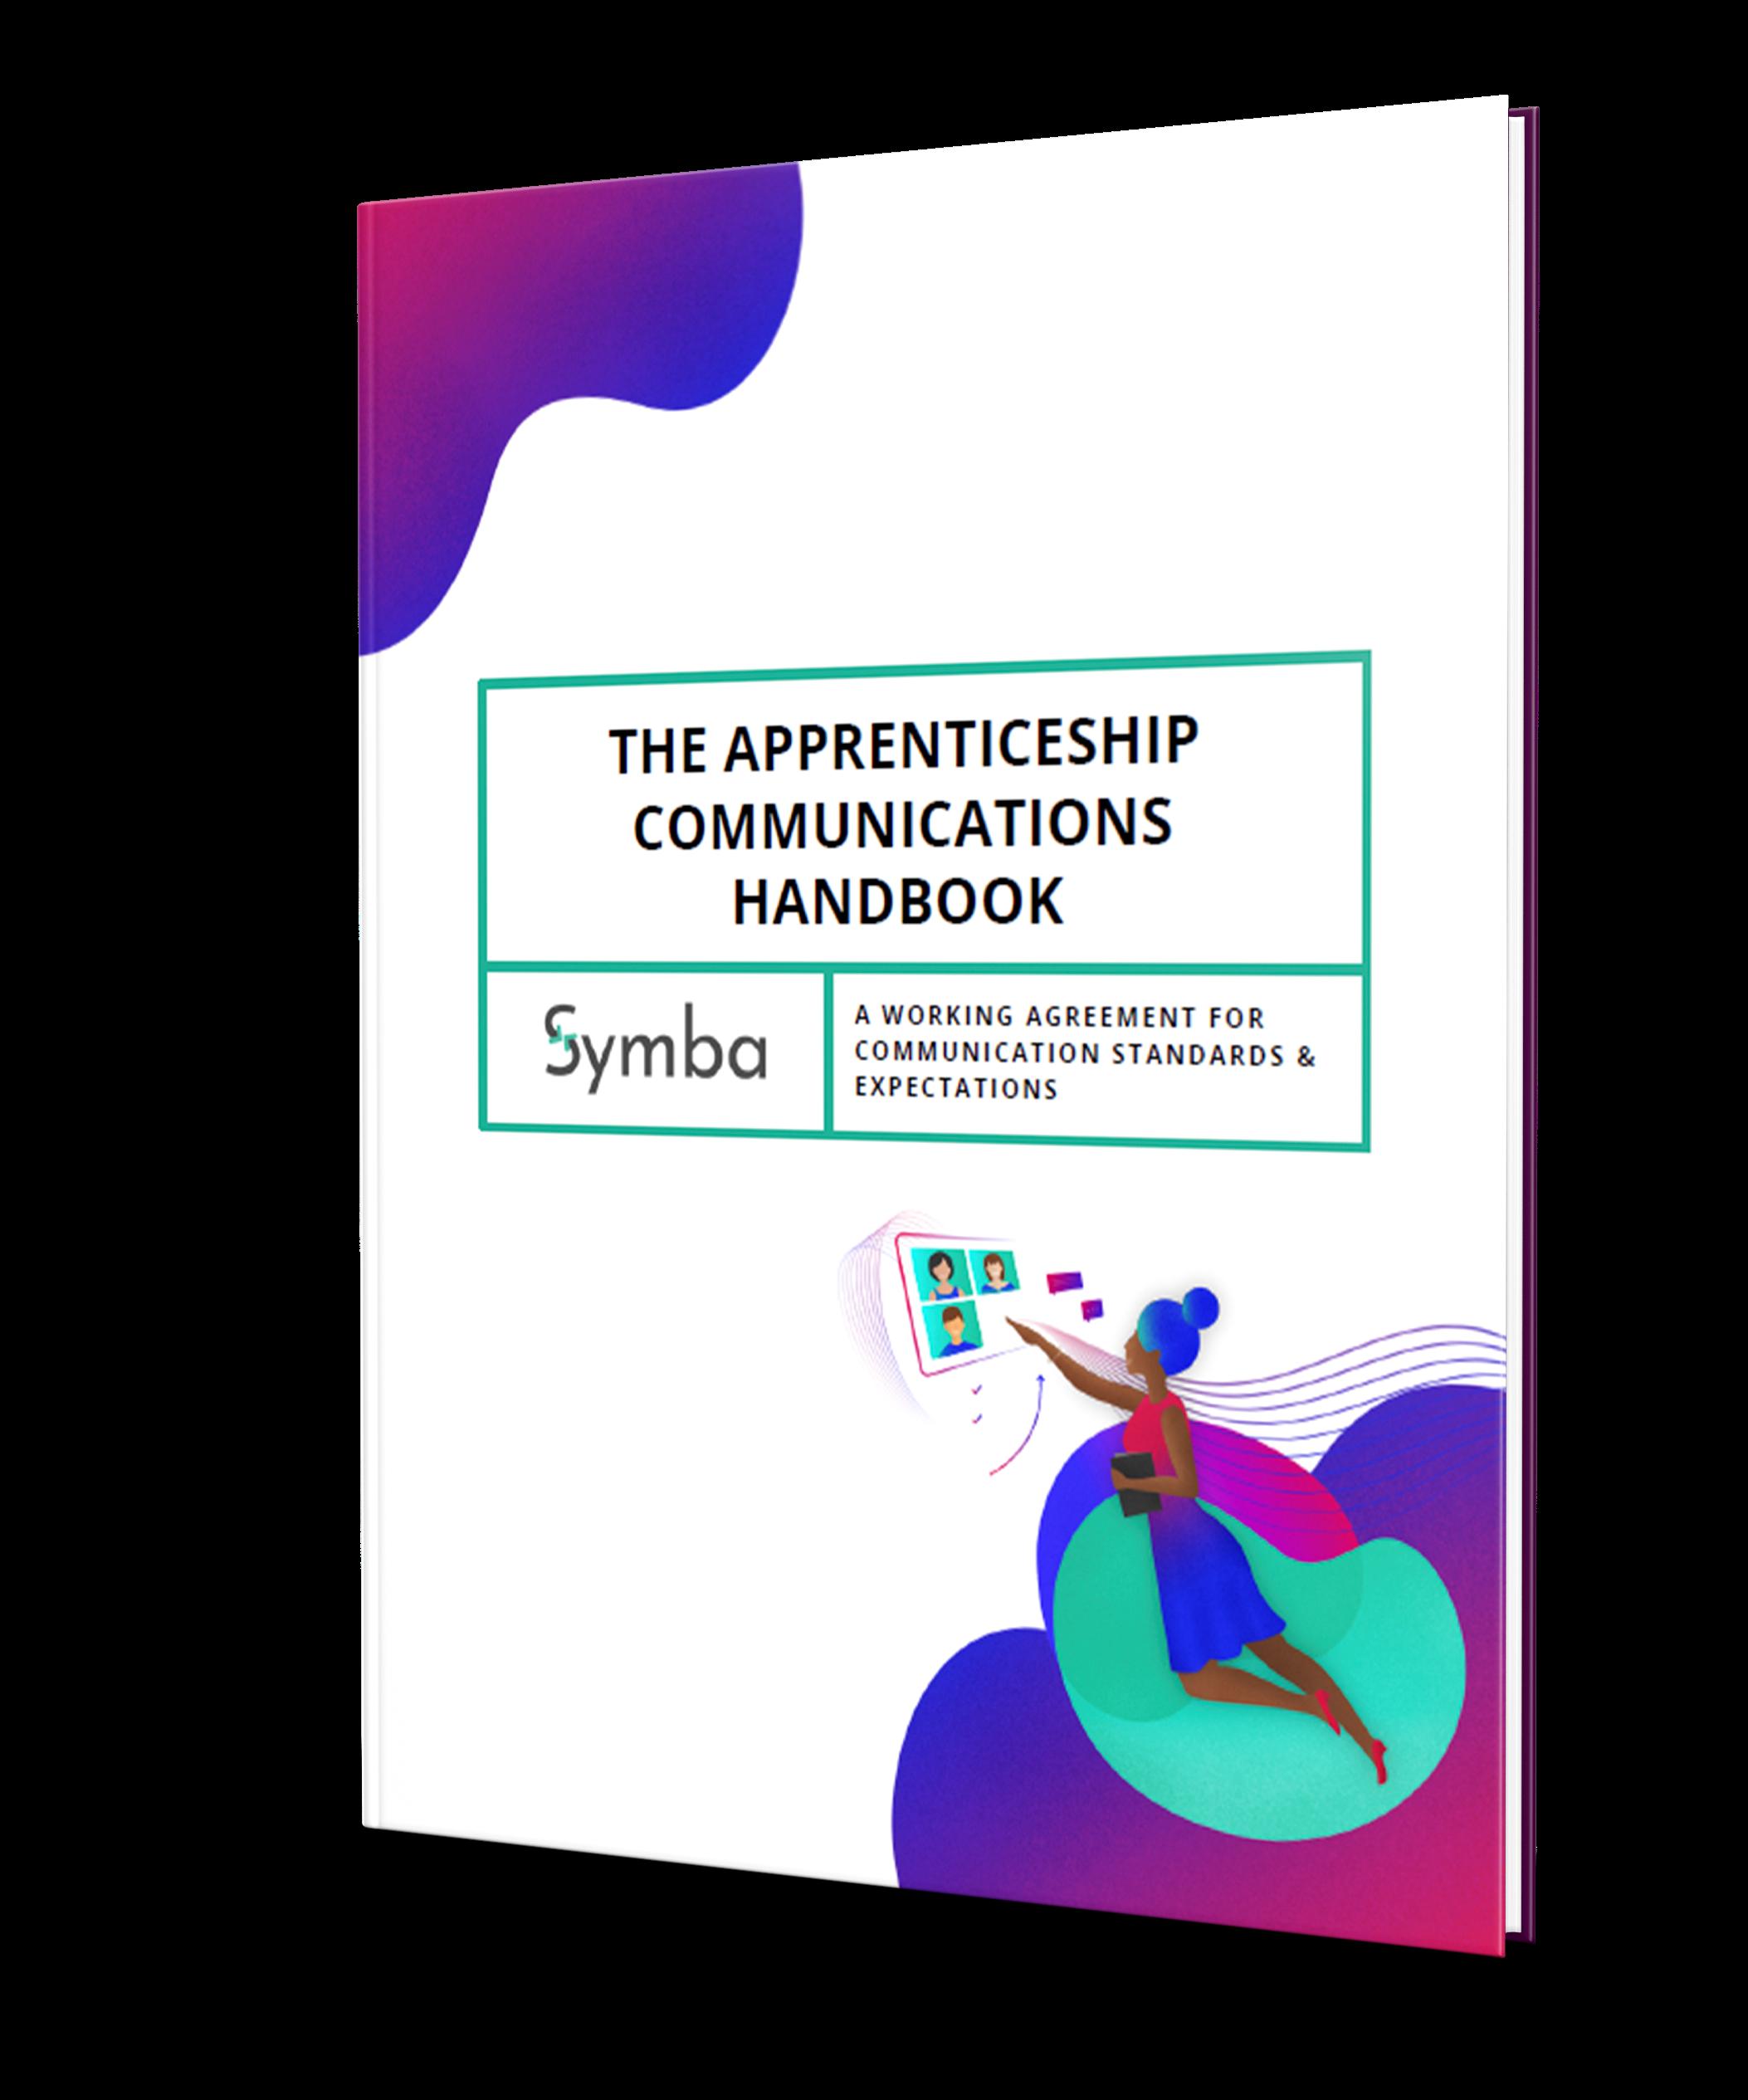 apprenticeship-handbook-cover